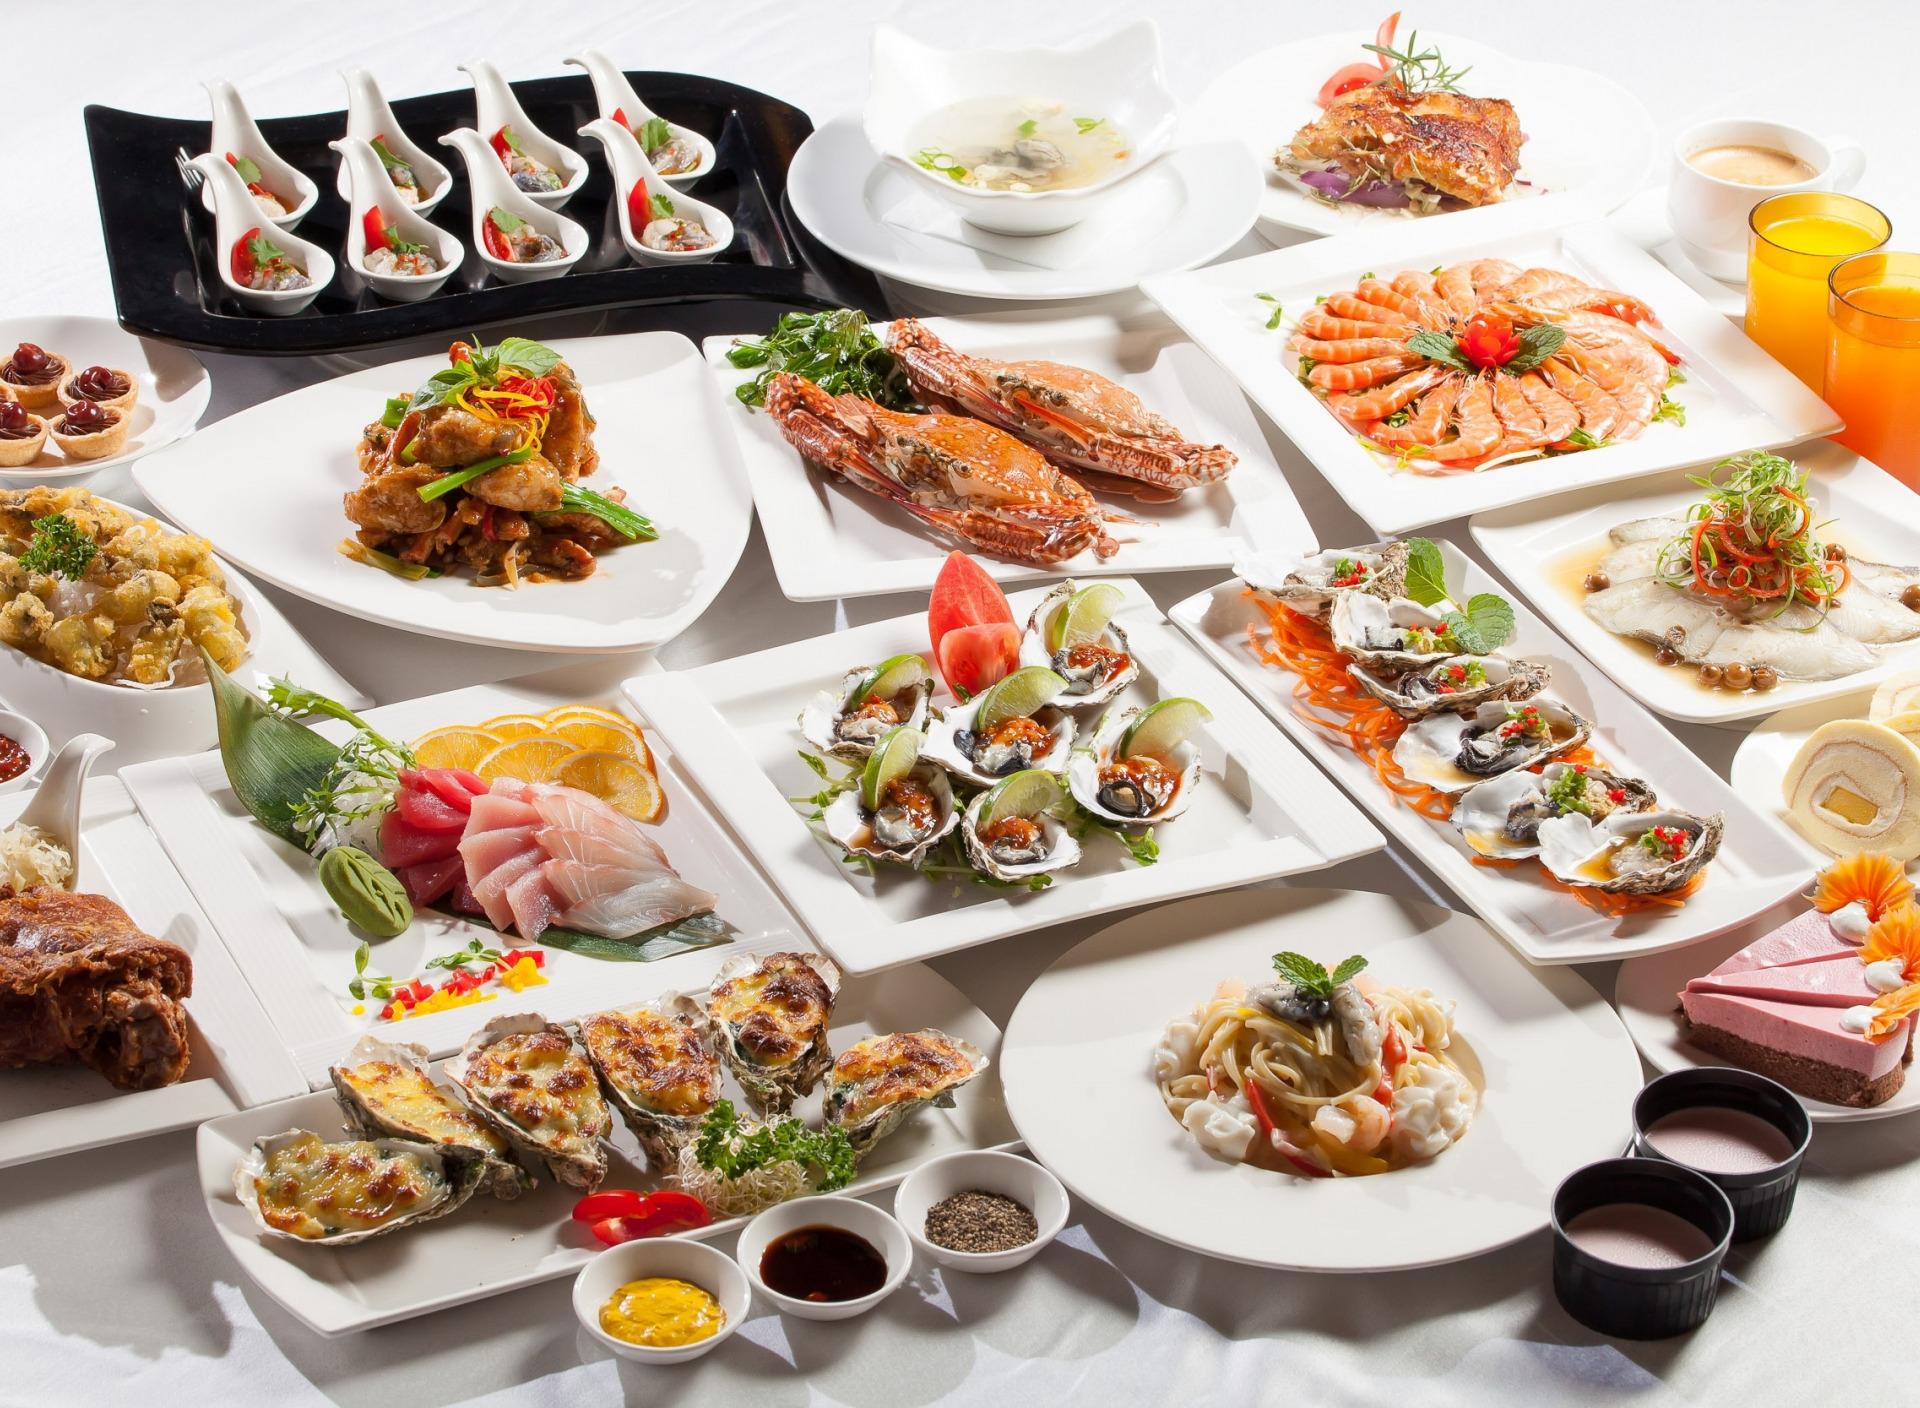 целине достаточно еда на столе фото варлей